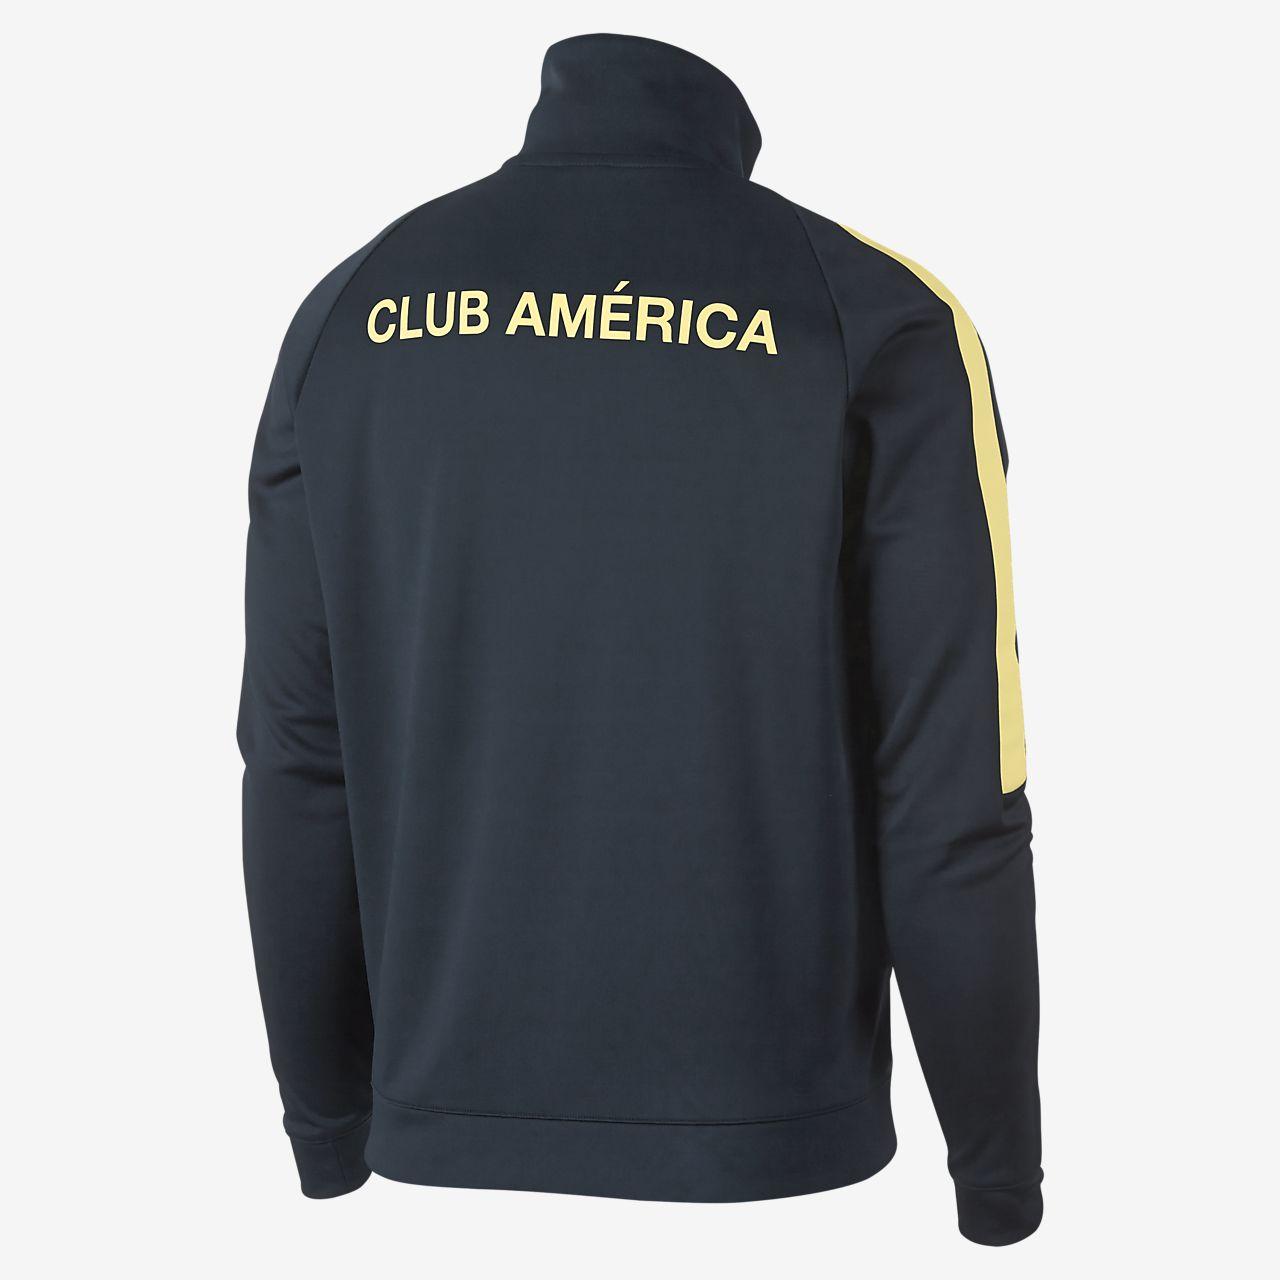 Club America Nike Running Shoes